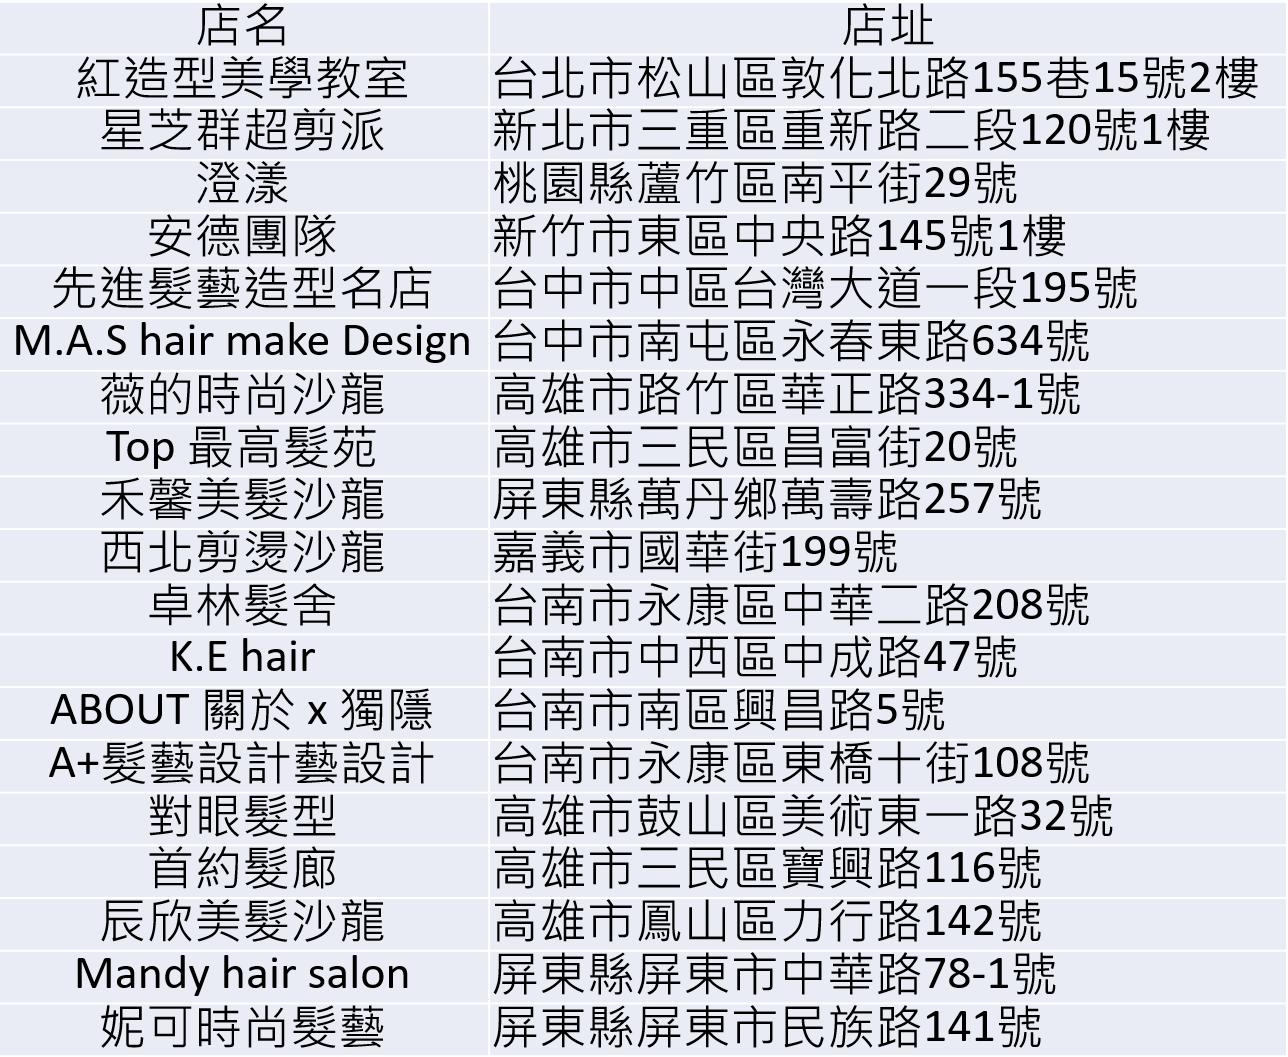 JOICO, DefyDamage, 鏈鍵強化鎖色潔髮乳, 鏈鍵強化鎖色瞬效髮霜, 禦髮系列, 美髮沙龍, 沙龍推薦, 美髮推薦, 洗髮推薦, 護髮推薦, JOICO門市, JOICO櫃點, JOICO網購, JOICO哪裡買, JOICO台灣, JOICO試用, 試用, 體驗